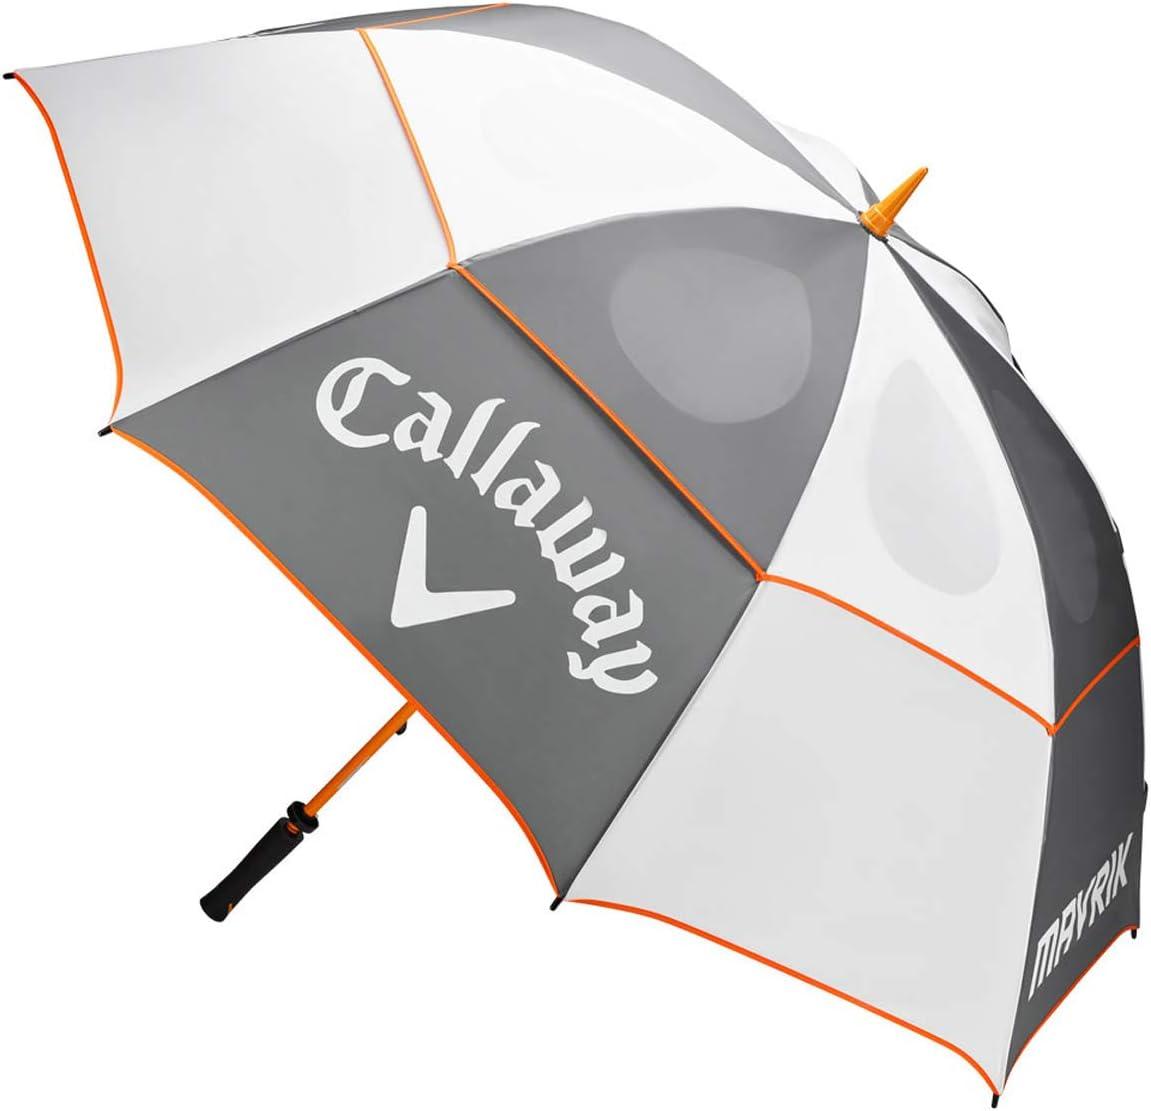 Callaway Mavrik Double Canopy Golf Umbrella White Charcoal Orange New 2020 Sports Outdoors